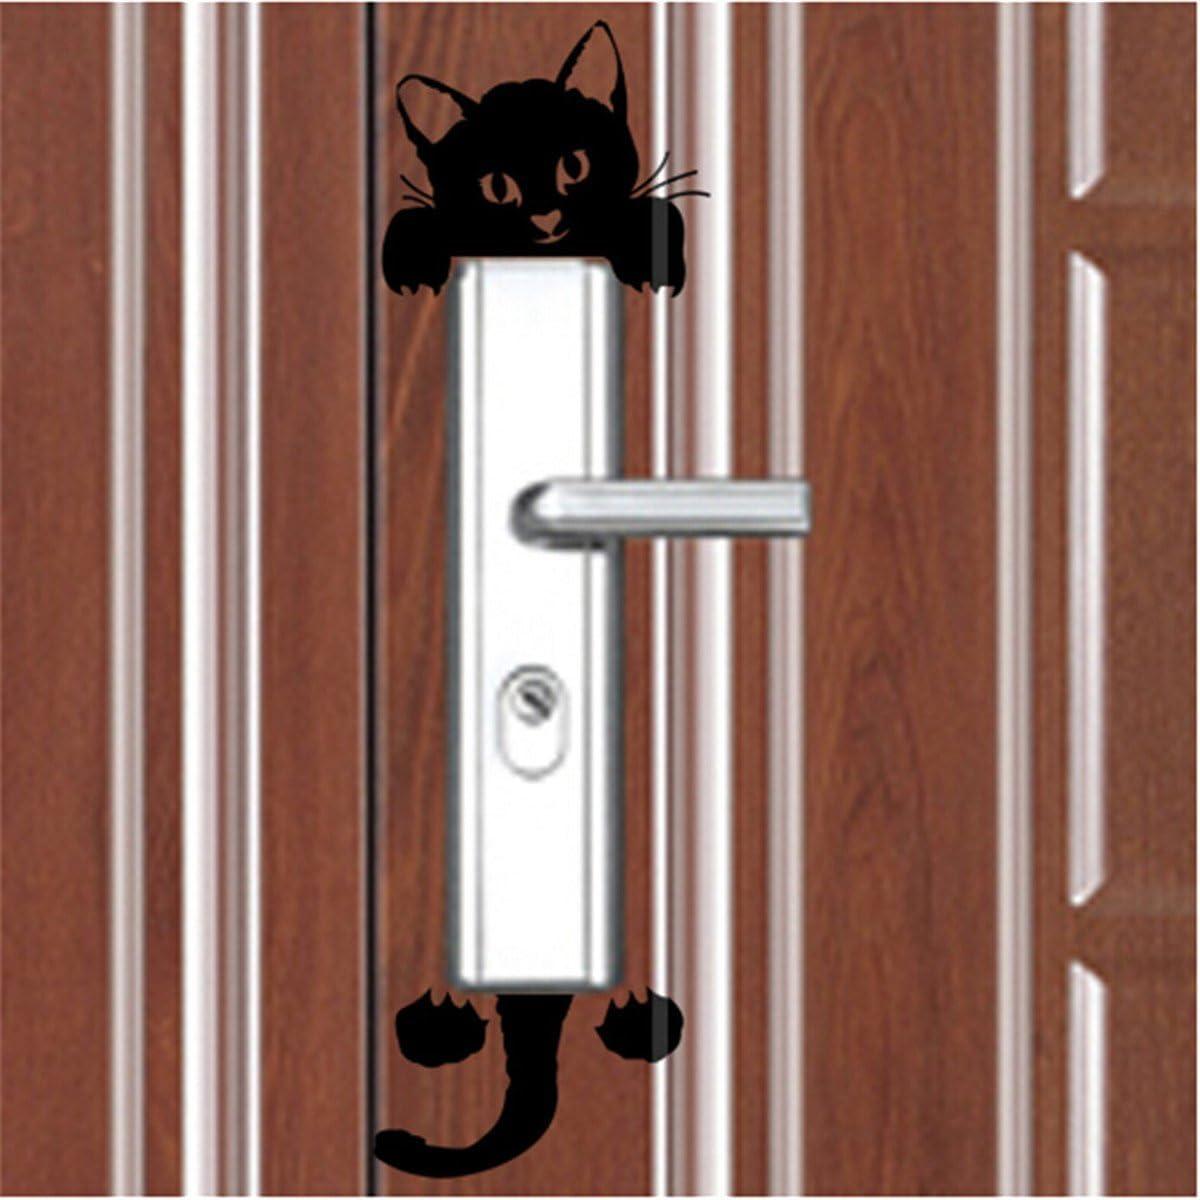 Cute Set of 12 Pet Dog Cat Black Wall Plug Decal Sticker Art D/écor Light Switch DIY Vivid Removable Mural Decoration for Kid Women Girl Nursery Living Room Bedroom